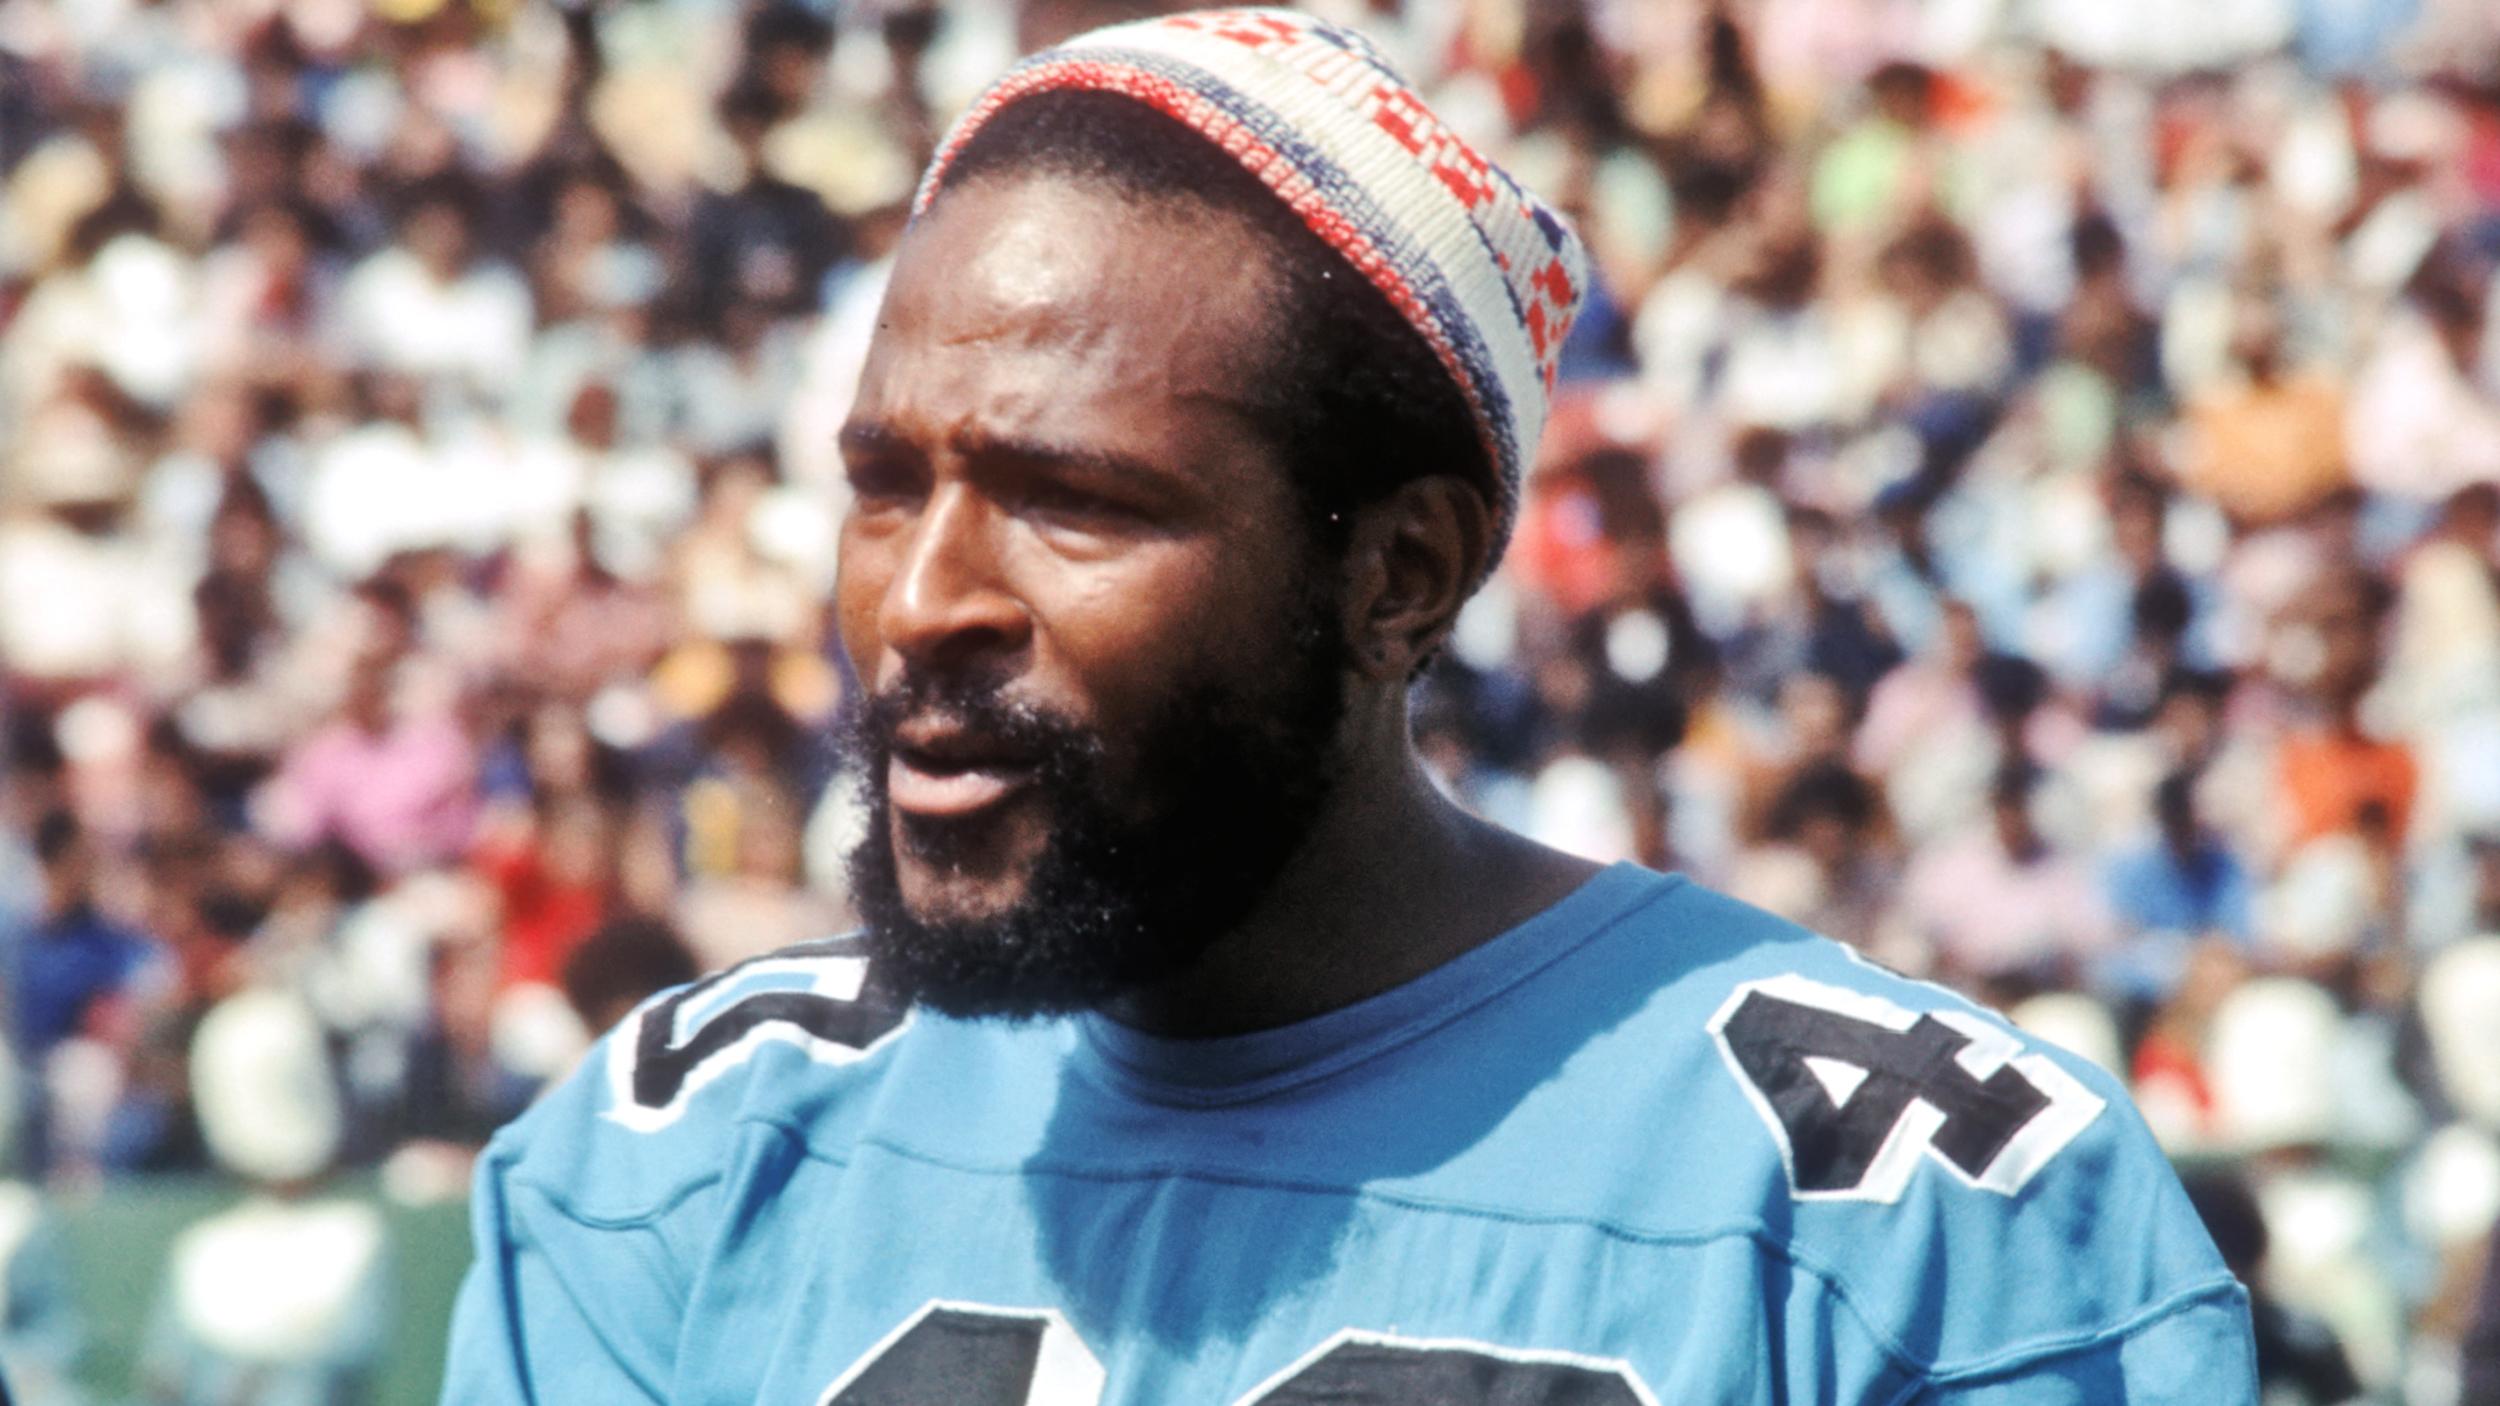 Soul Singer In A Football Uniform